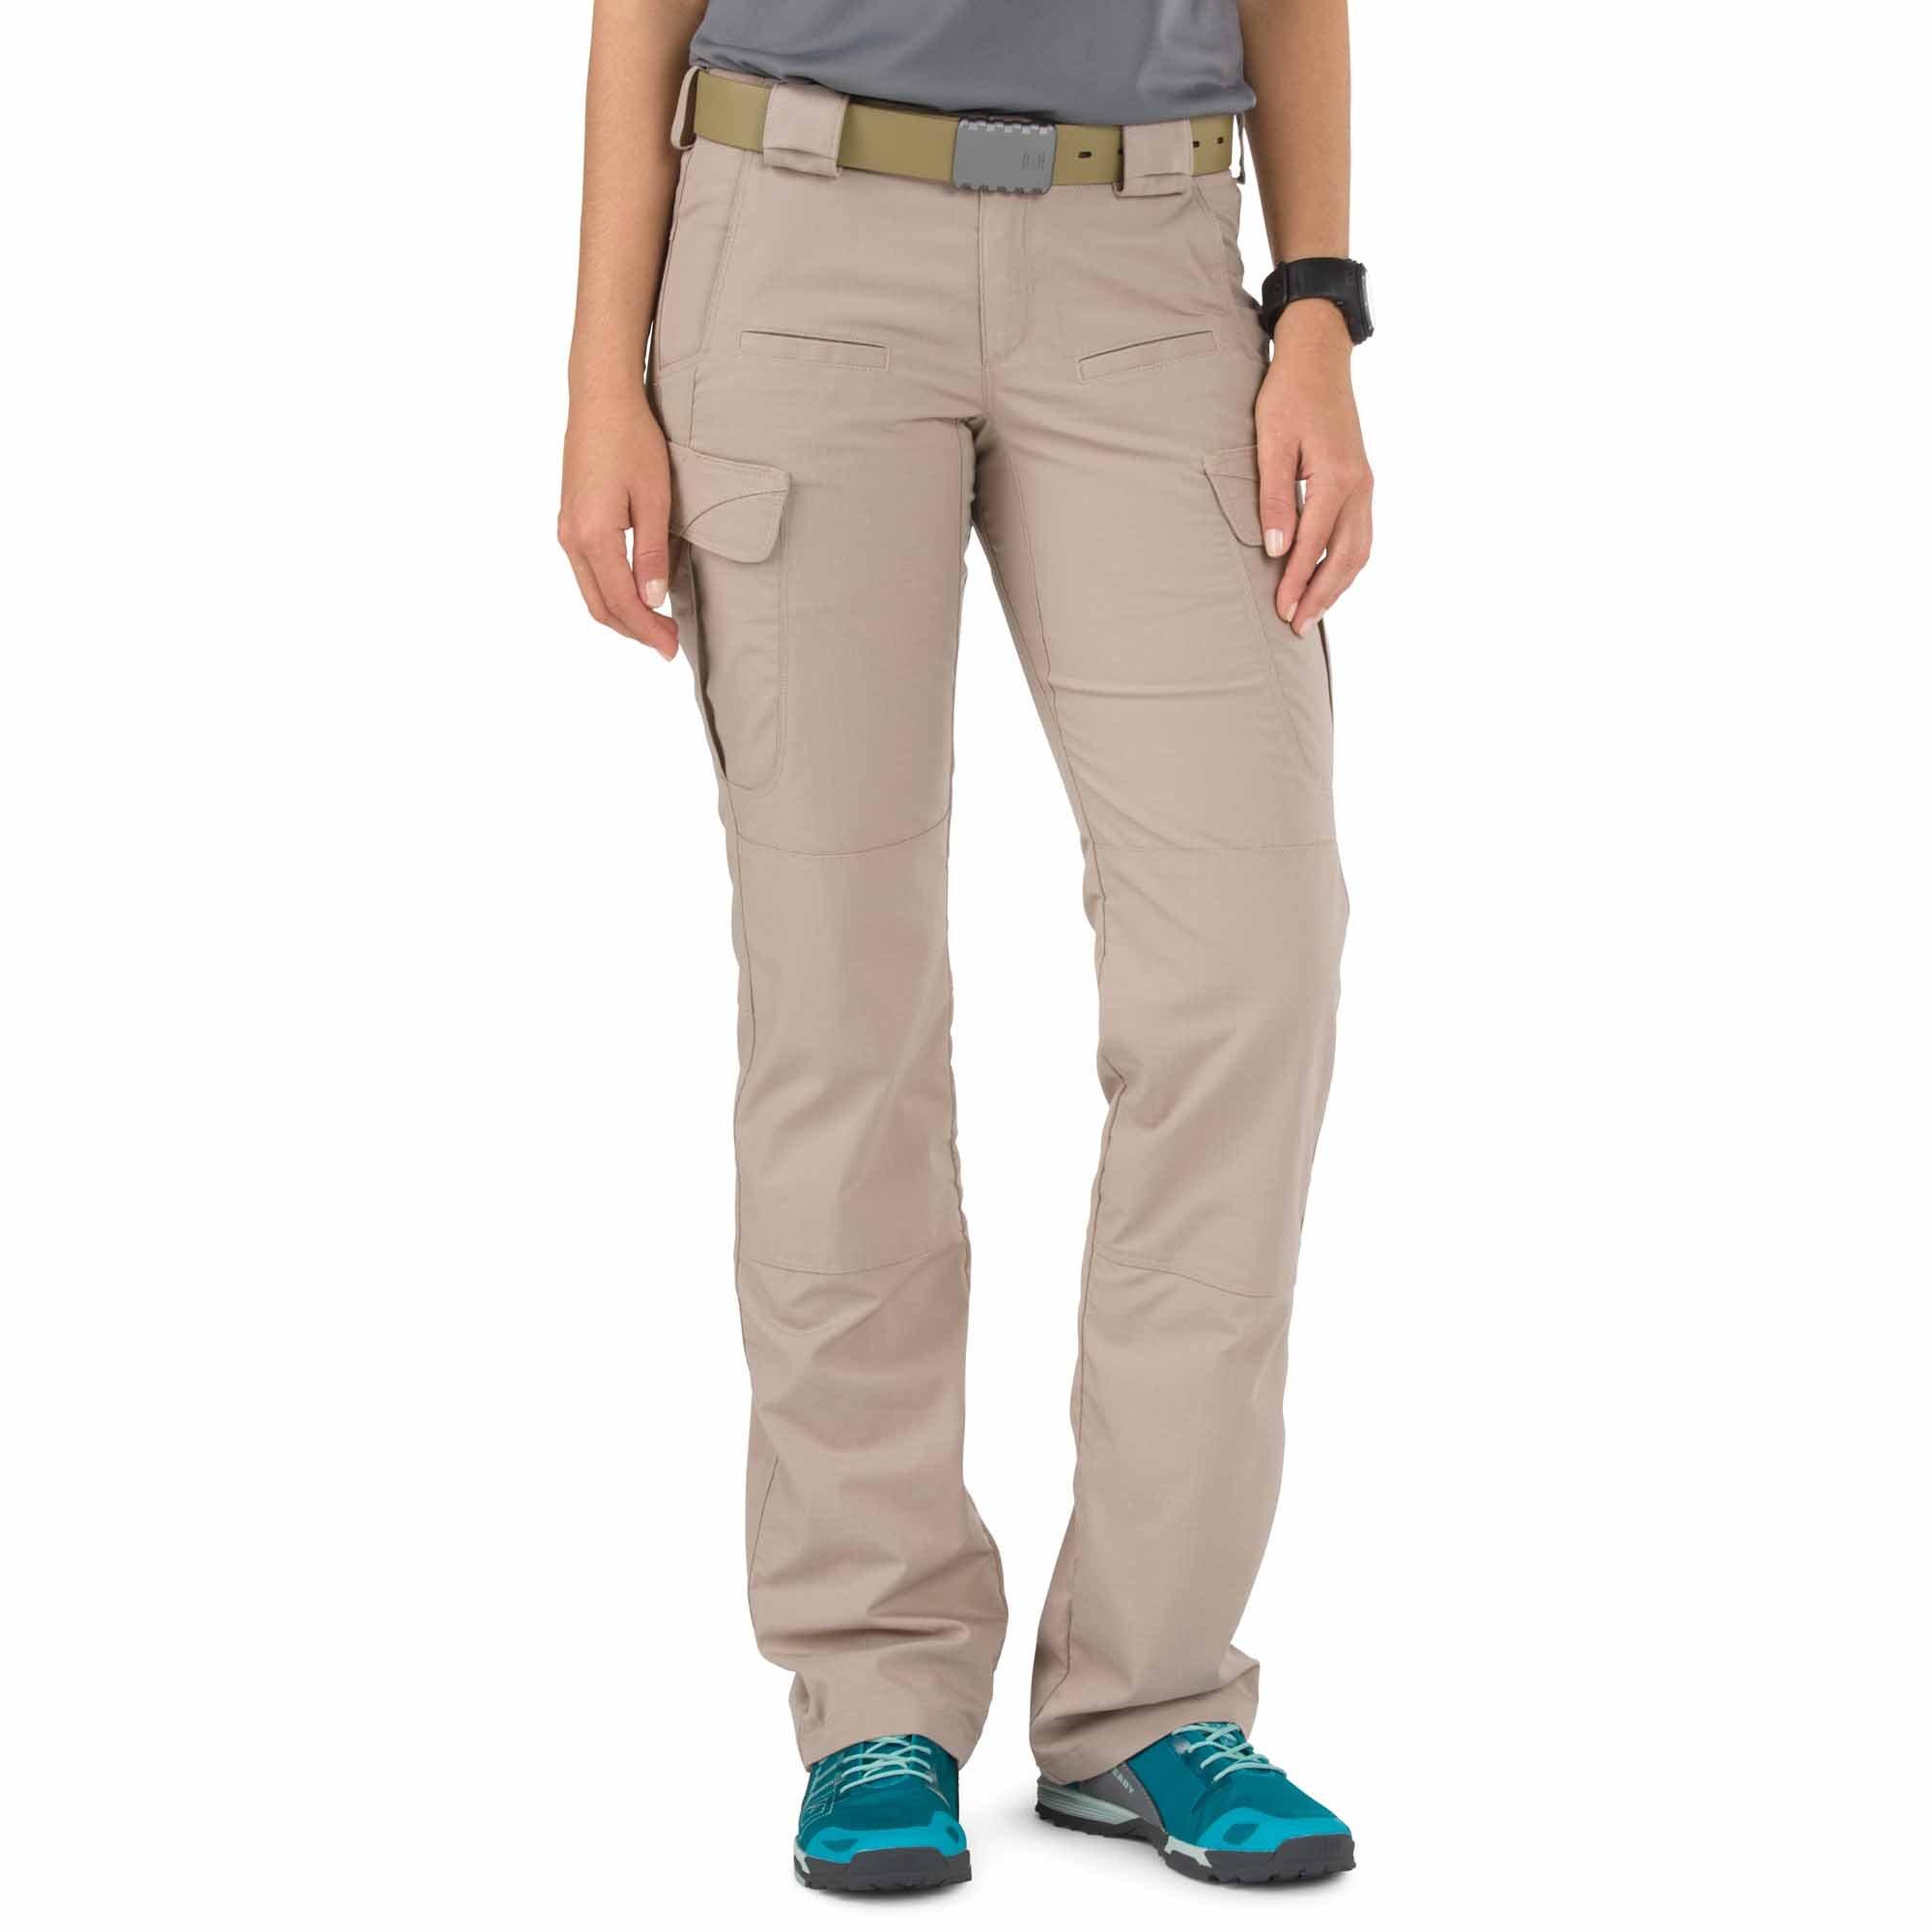 5.11 Tactical Women's Stryke Pant, Khaki, 12 R by 5.11